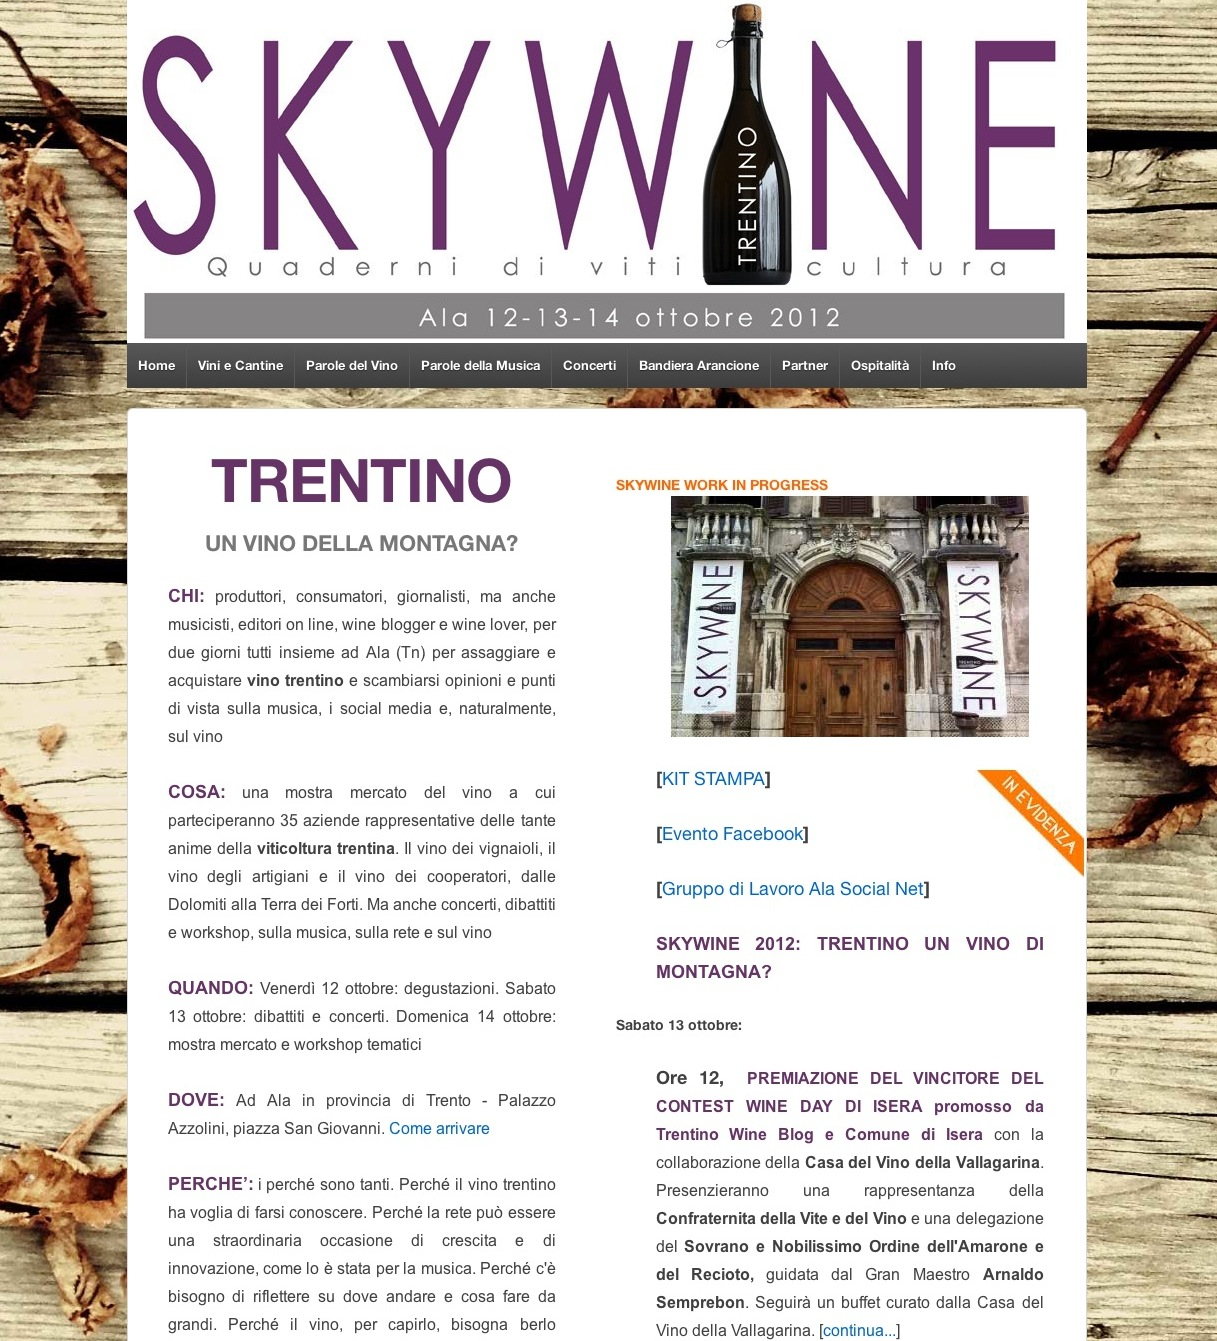 Skywine 2012